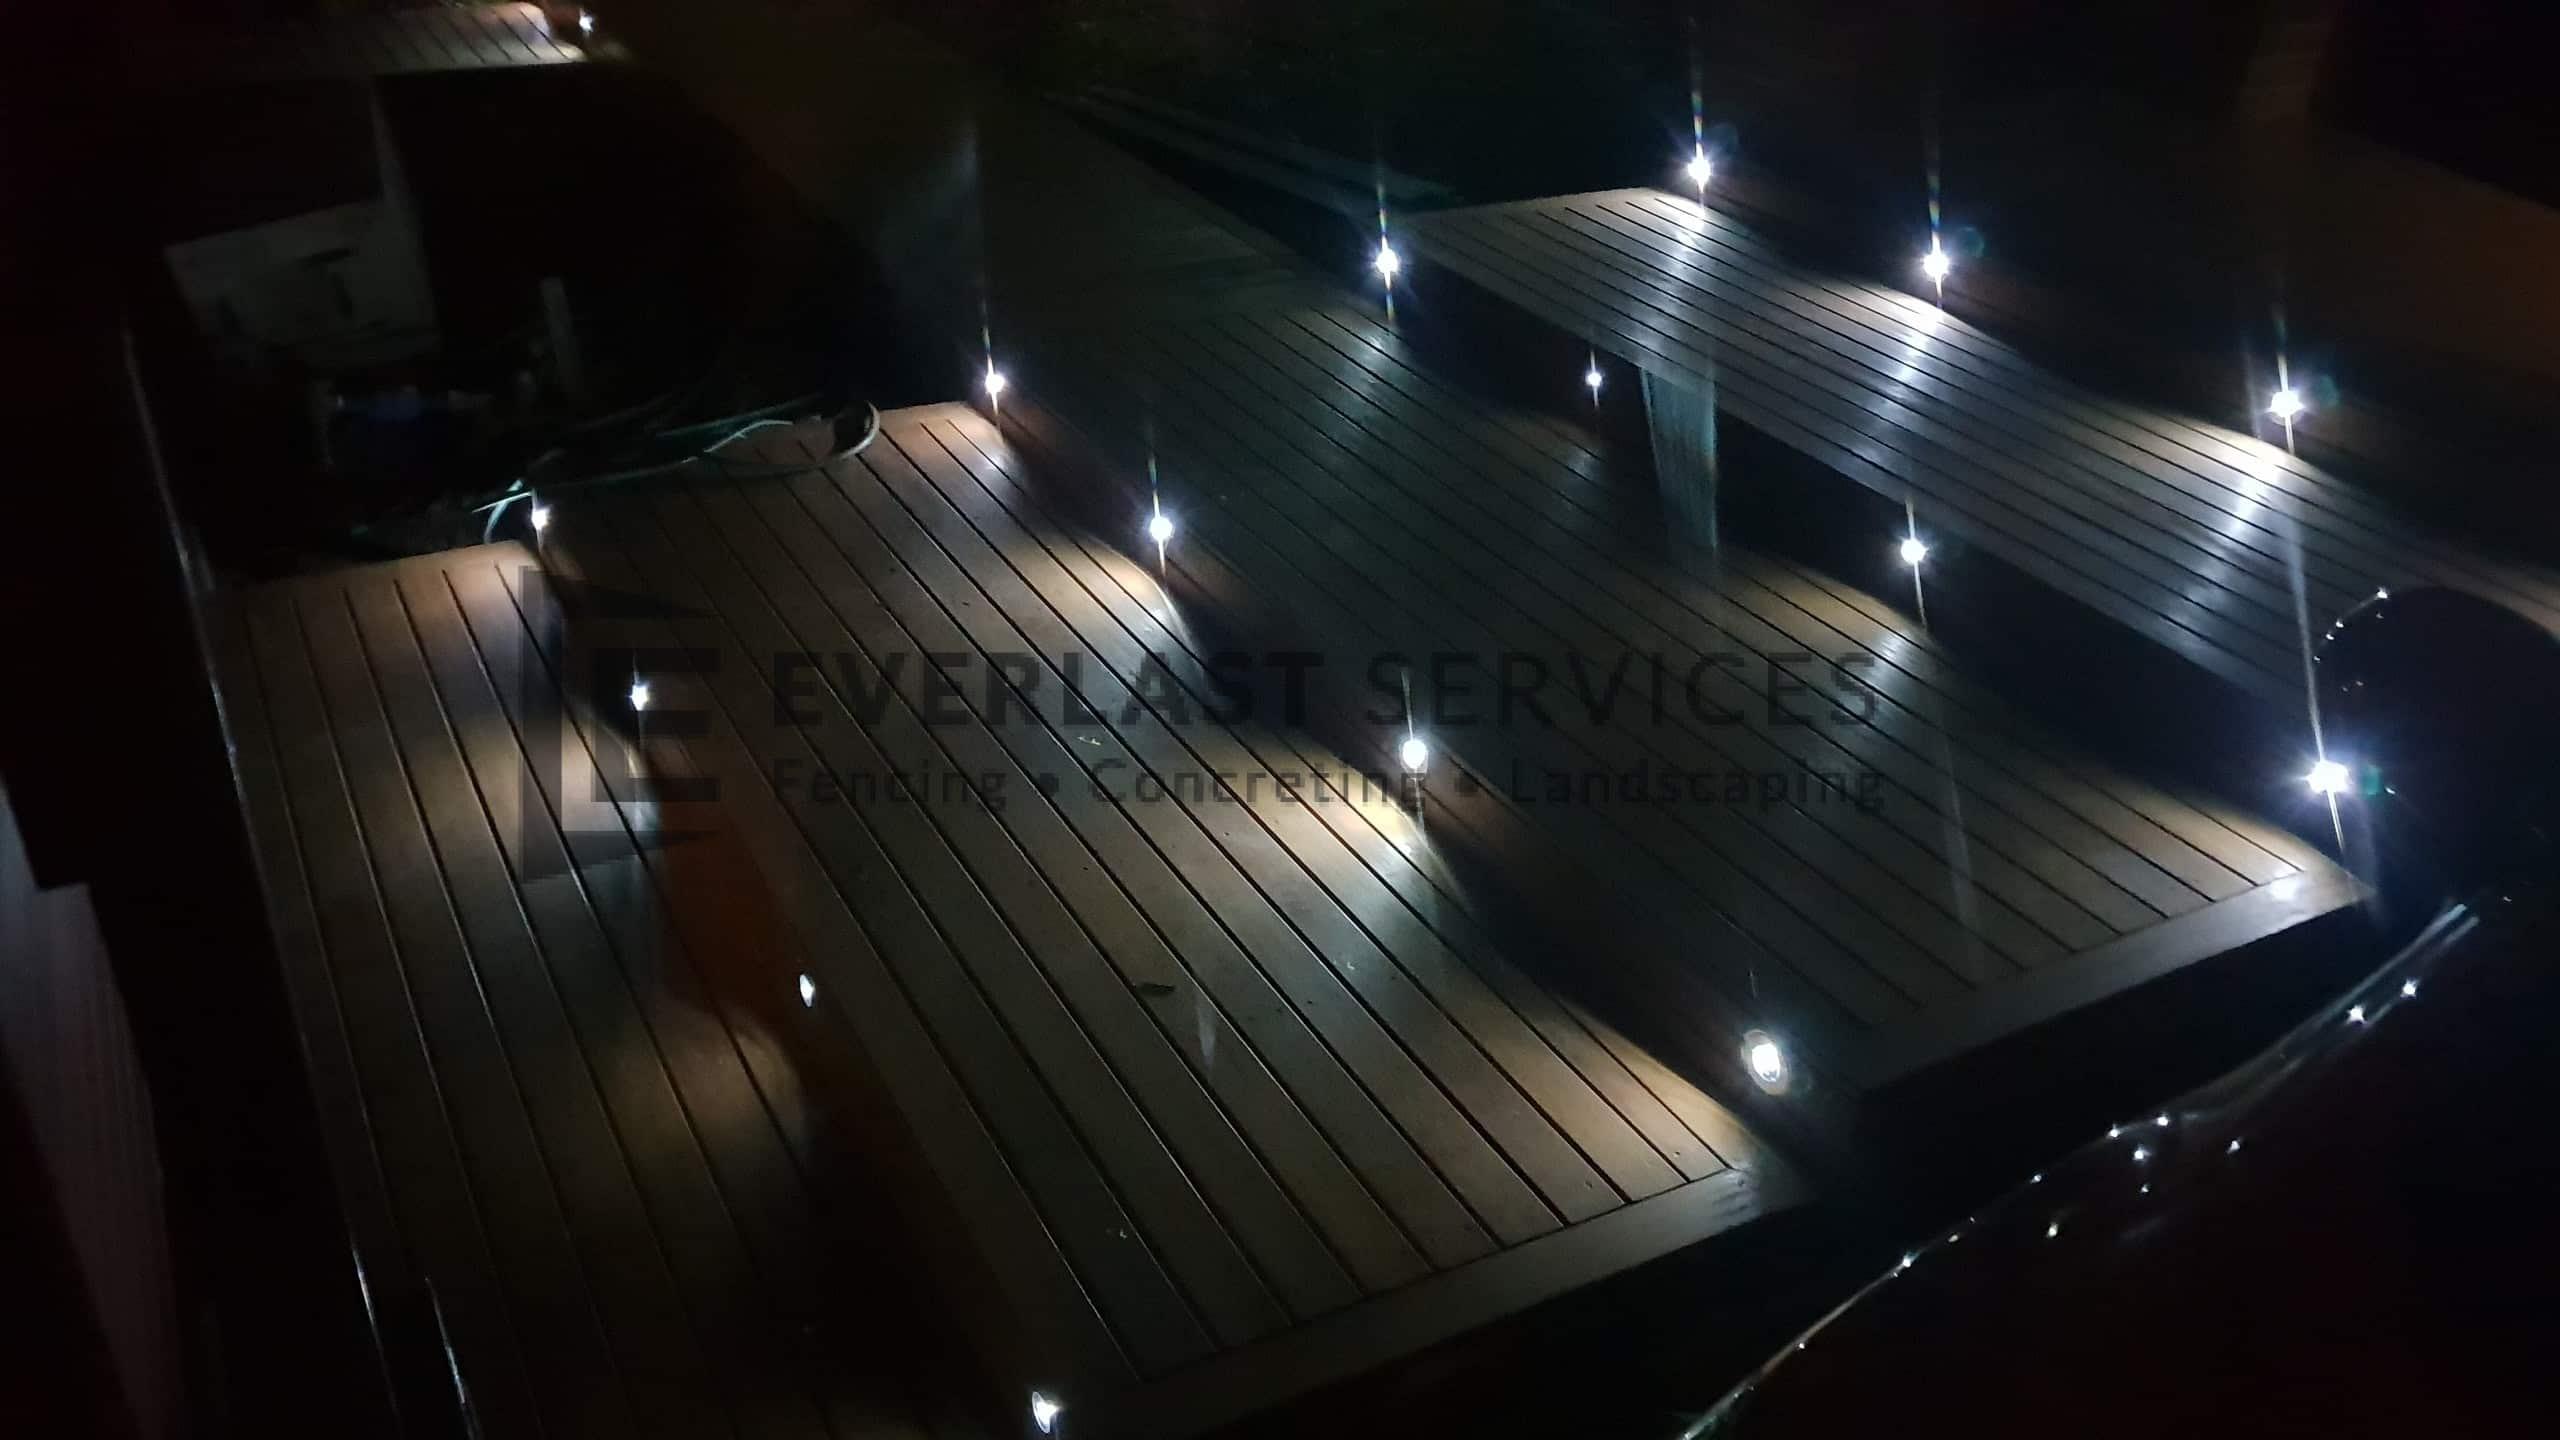 T182 - Decking Night Lights